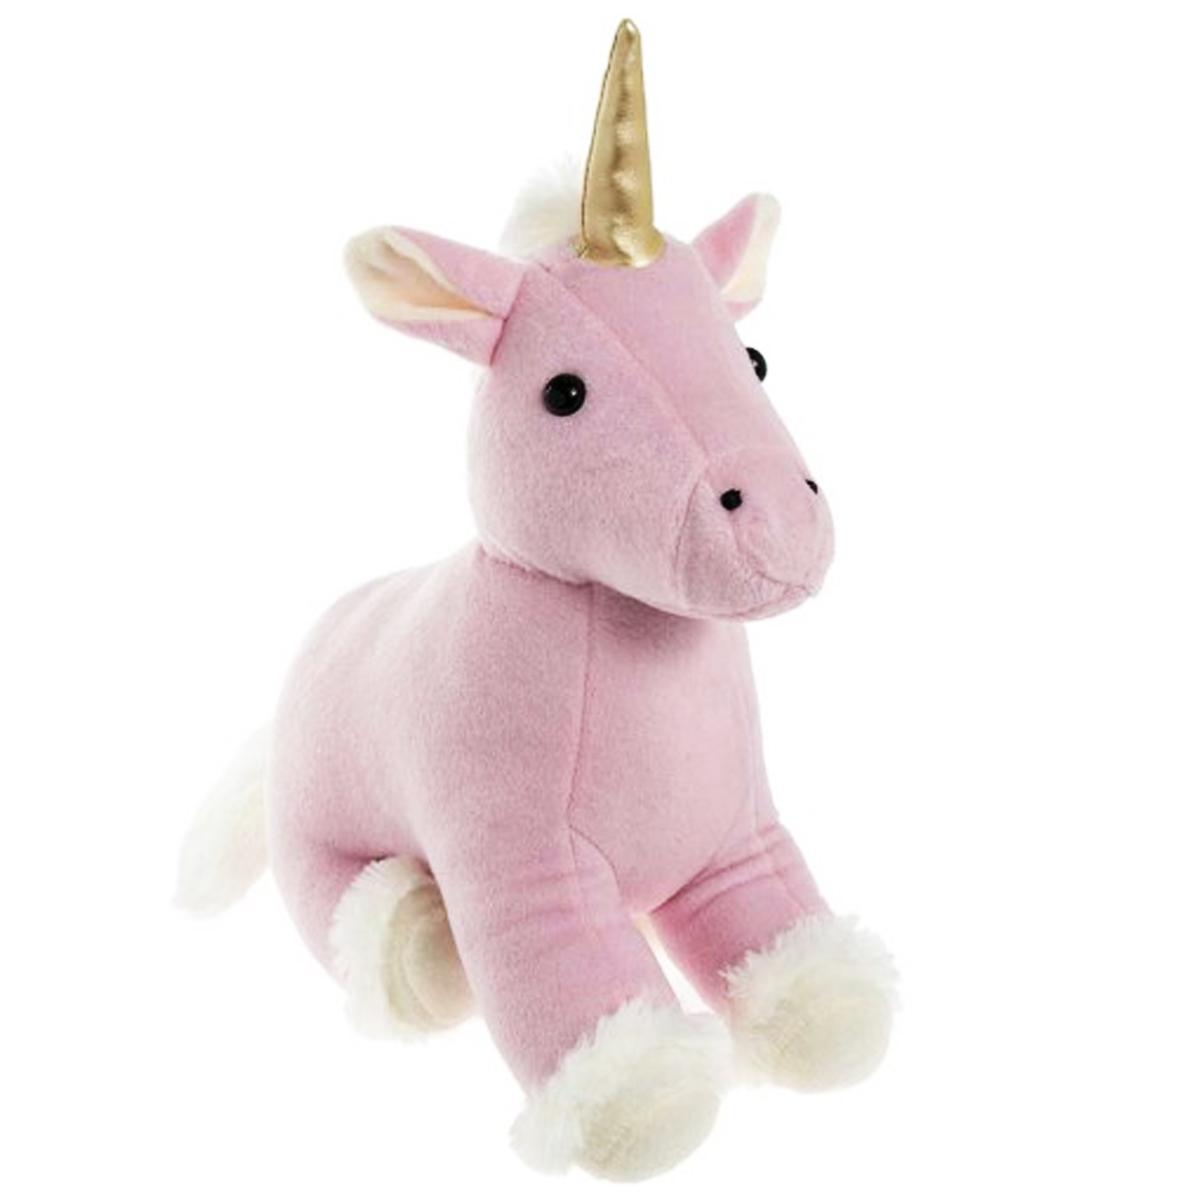 Peluche Cale porte \'Licorne My Unicorn\' rose - 36x30x12 cm - [Q0837]